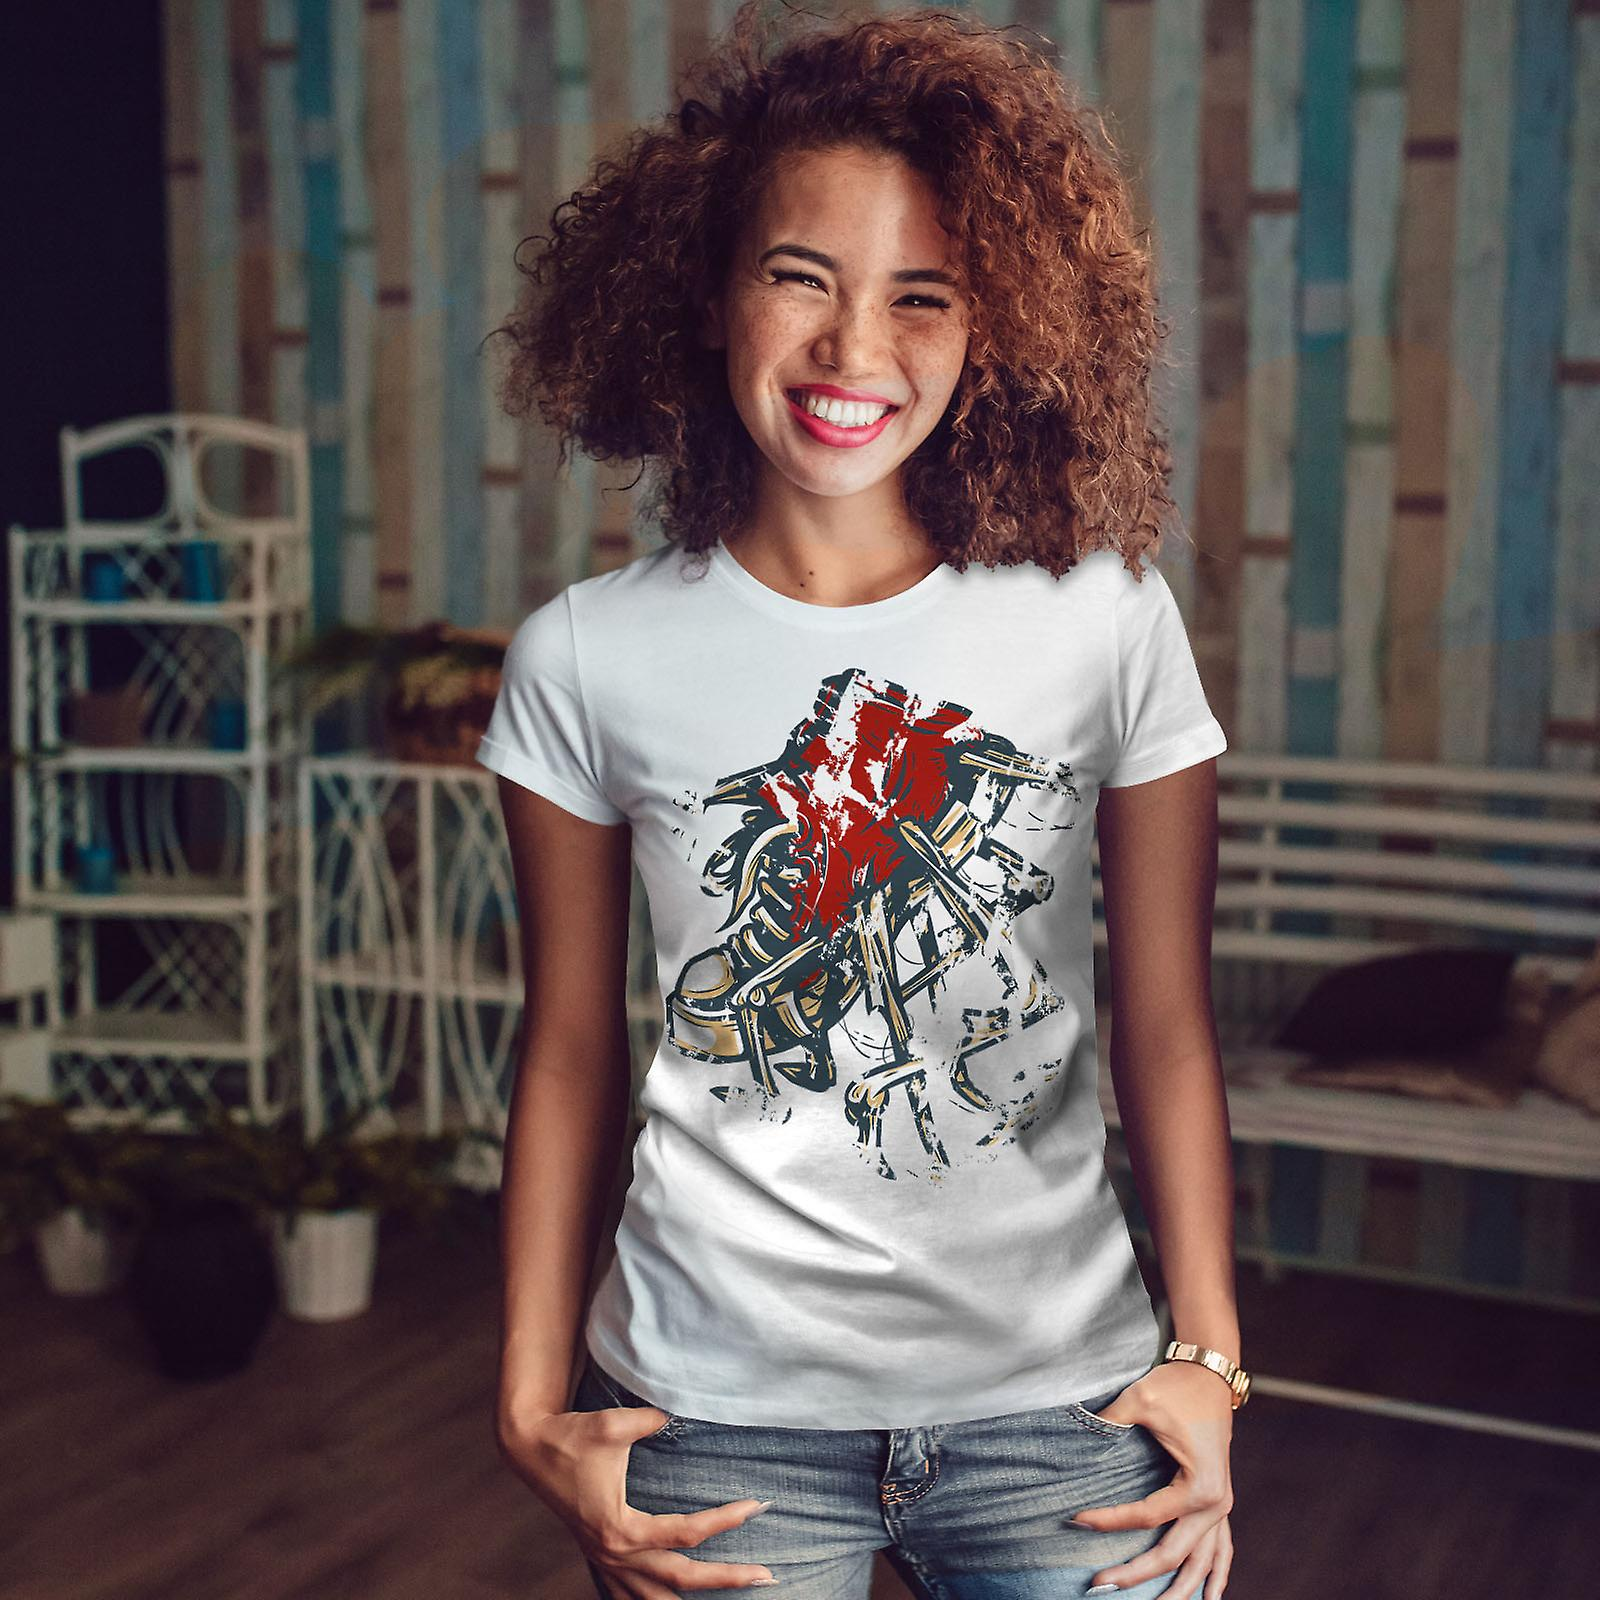 Chaussure WhiteT-shirt Swag Urban Fashion femme | Wellcoda